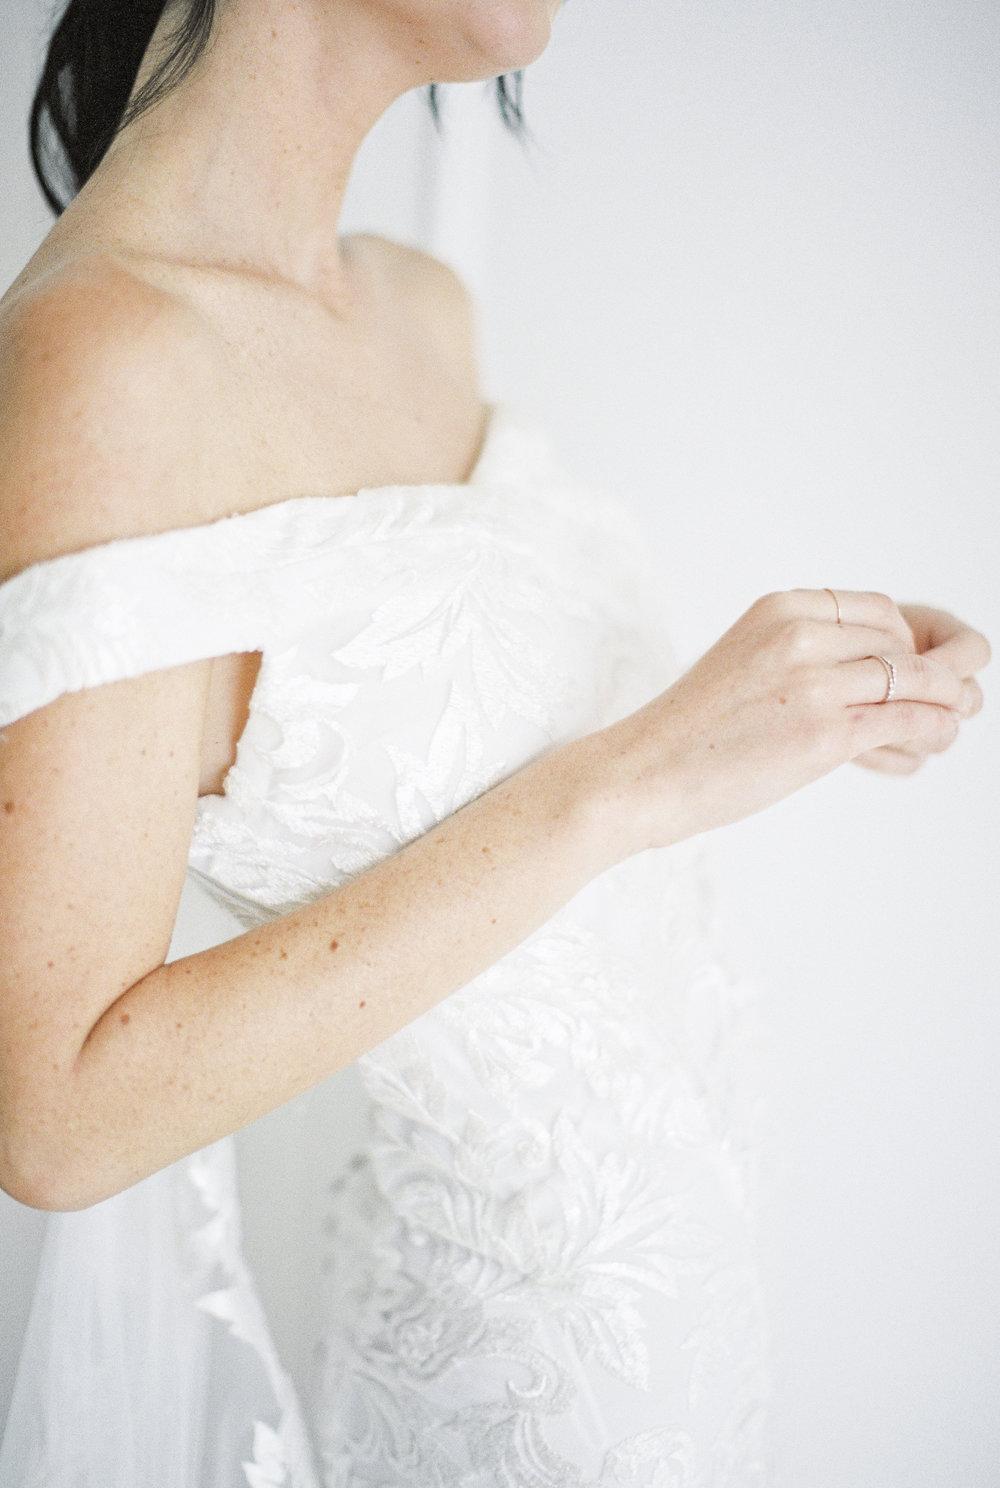 Ludovic Grau-Mingot - Film Photographer - Talitha - Wedding dresses - Collection 2019-75 (1).jpg